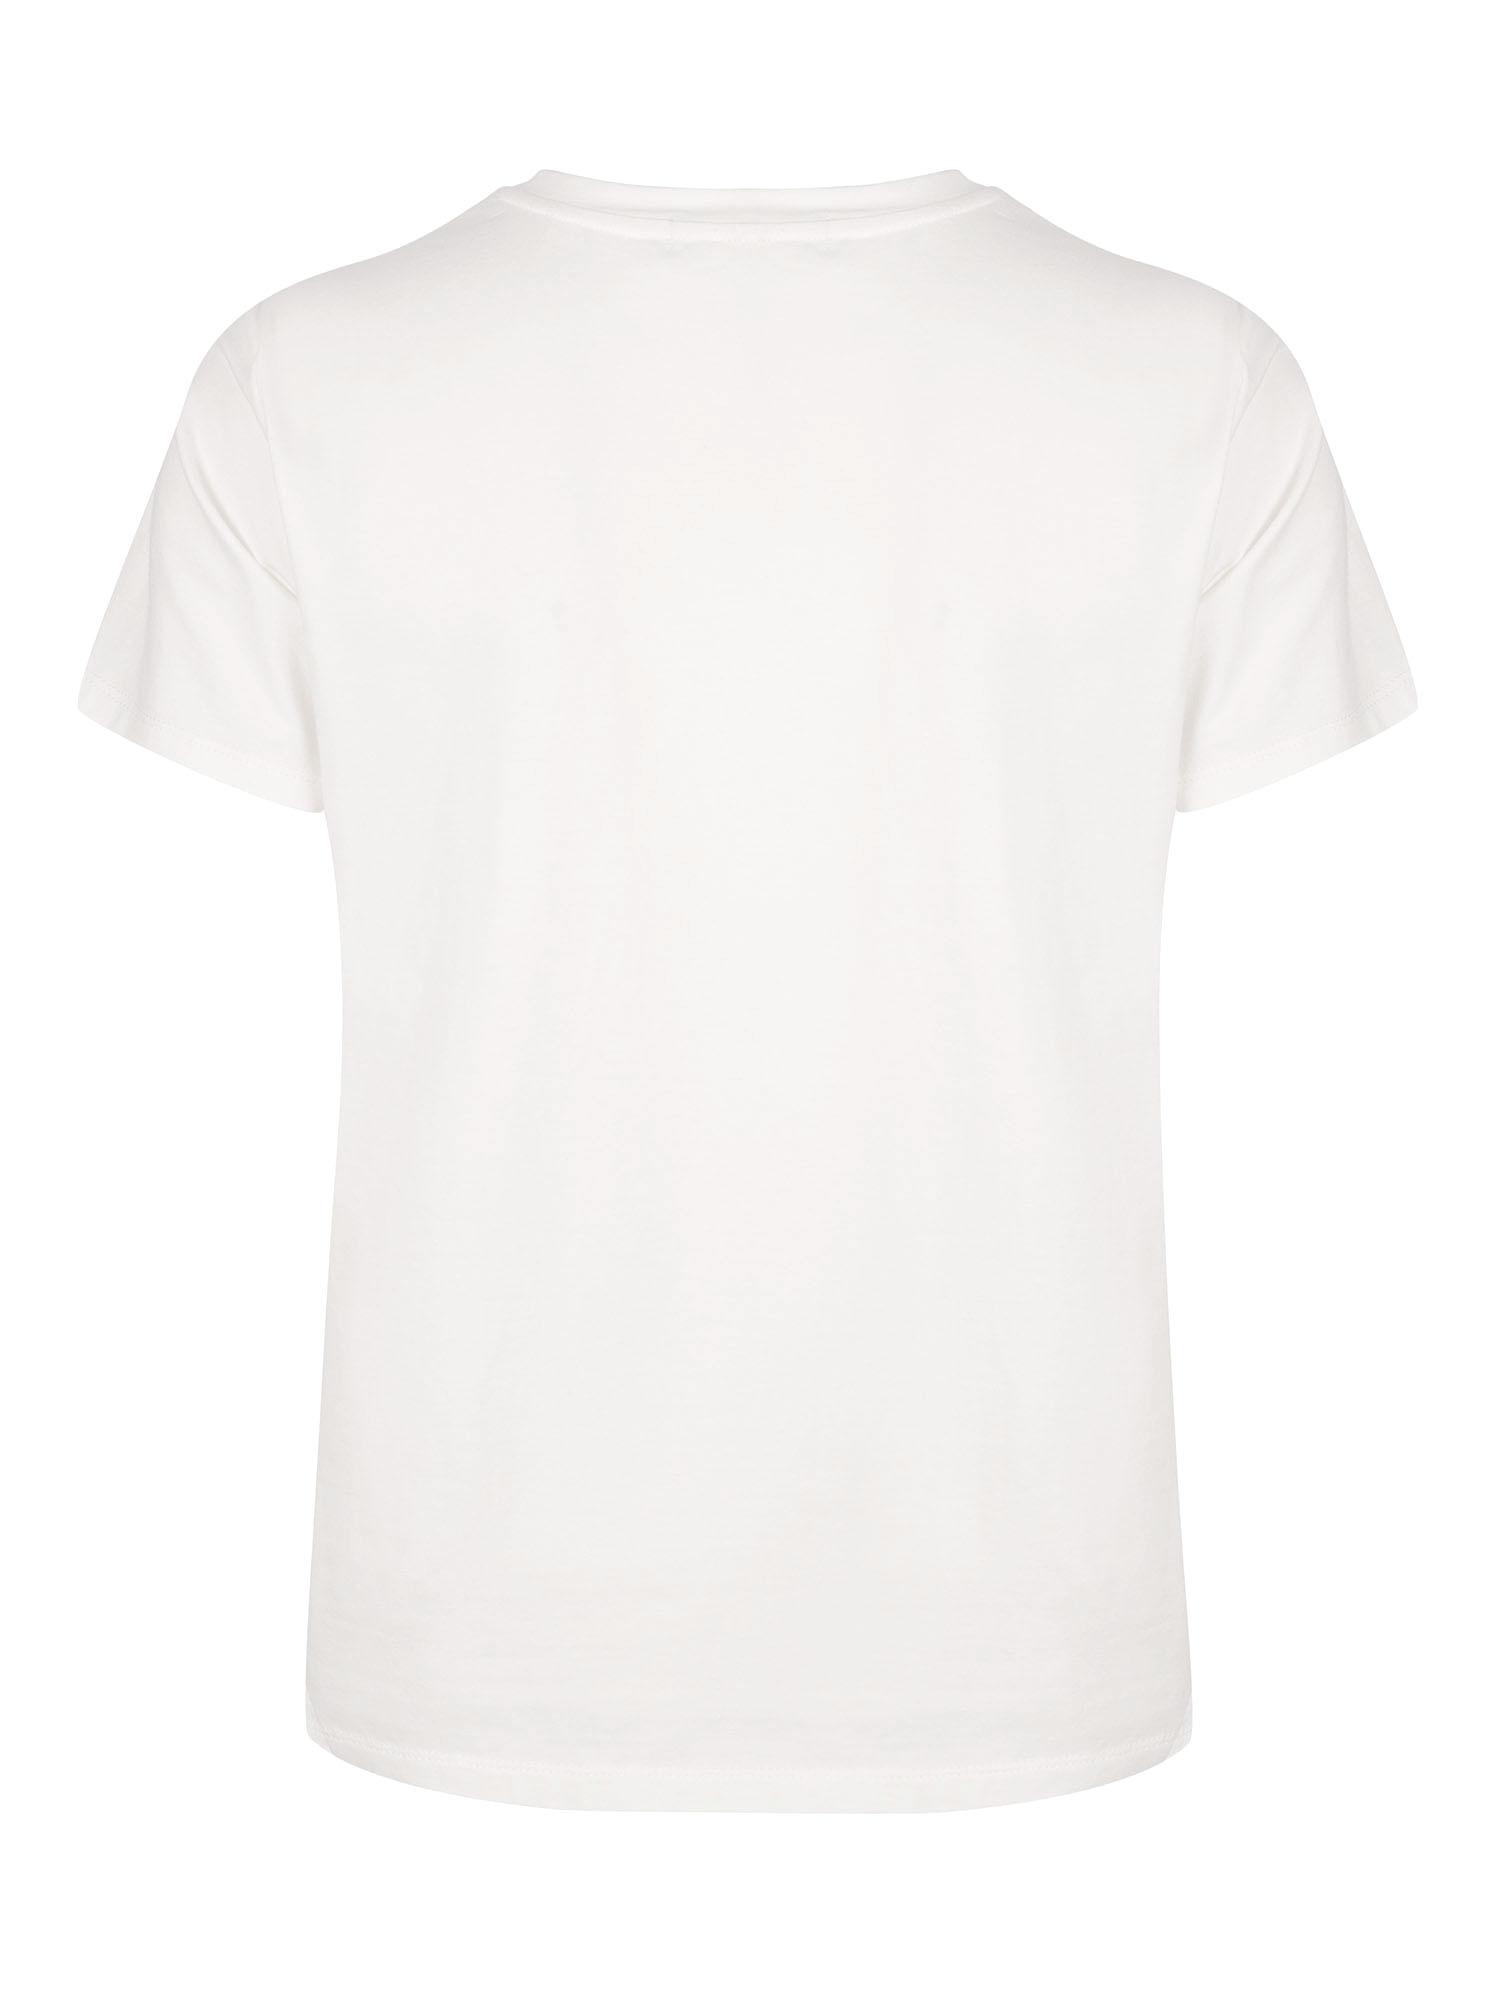 YDENCE YDENCE - T-shirt elephant wit